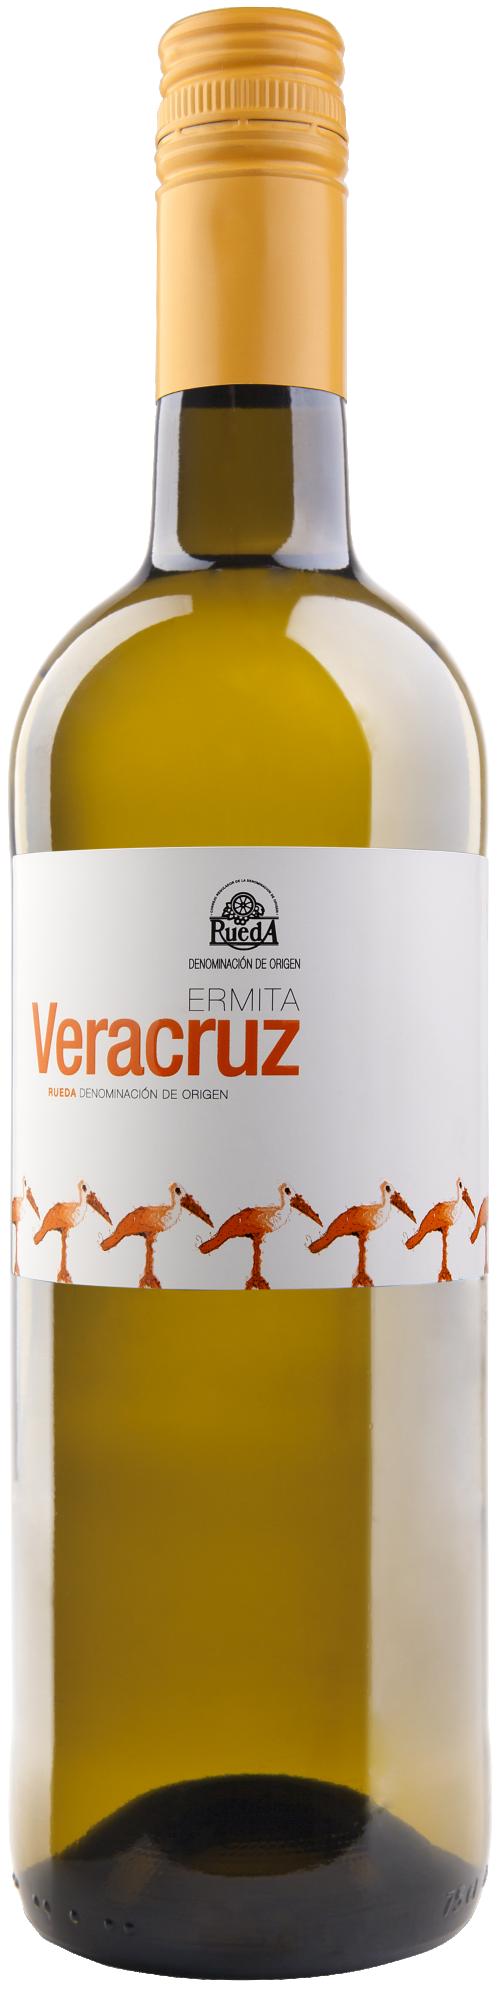 39-wit-ermita-veracruz-afbeelding